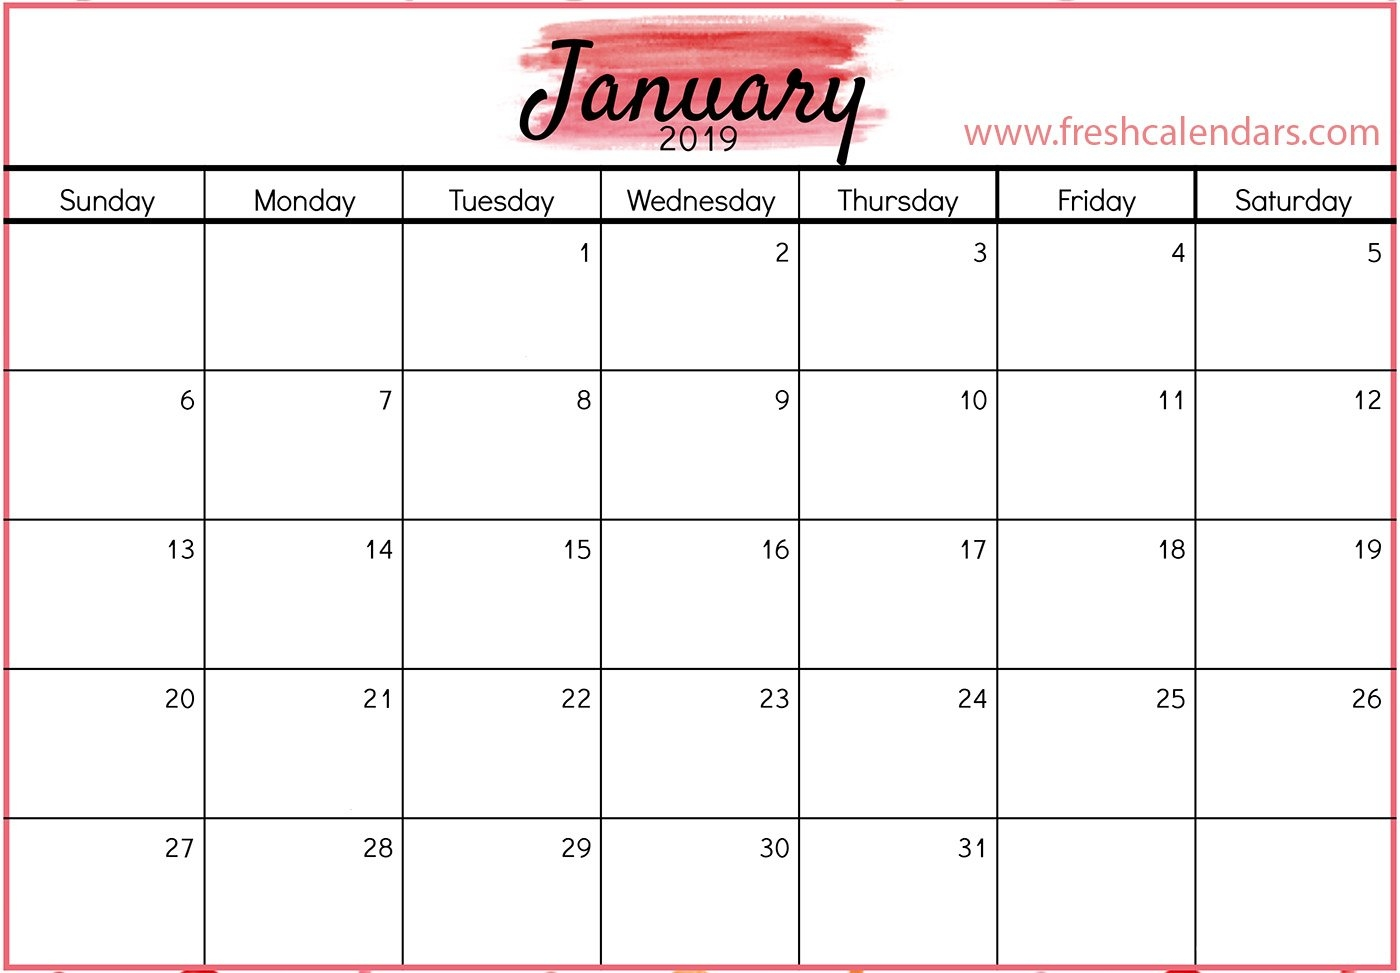 January 2019 Printable Calendars - Fresh Calendars Calendar 2019 January